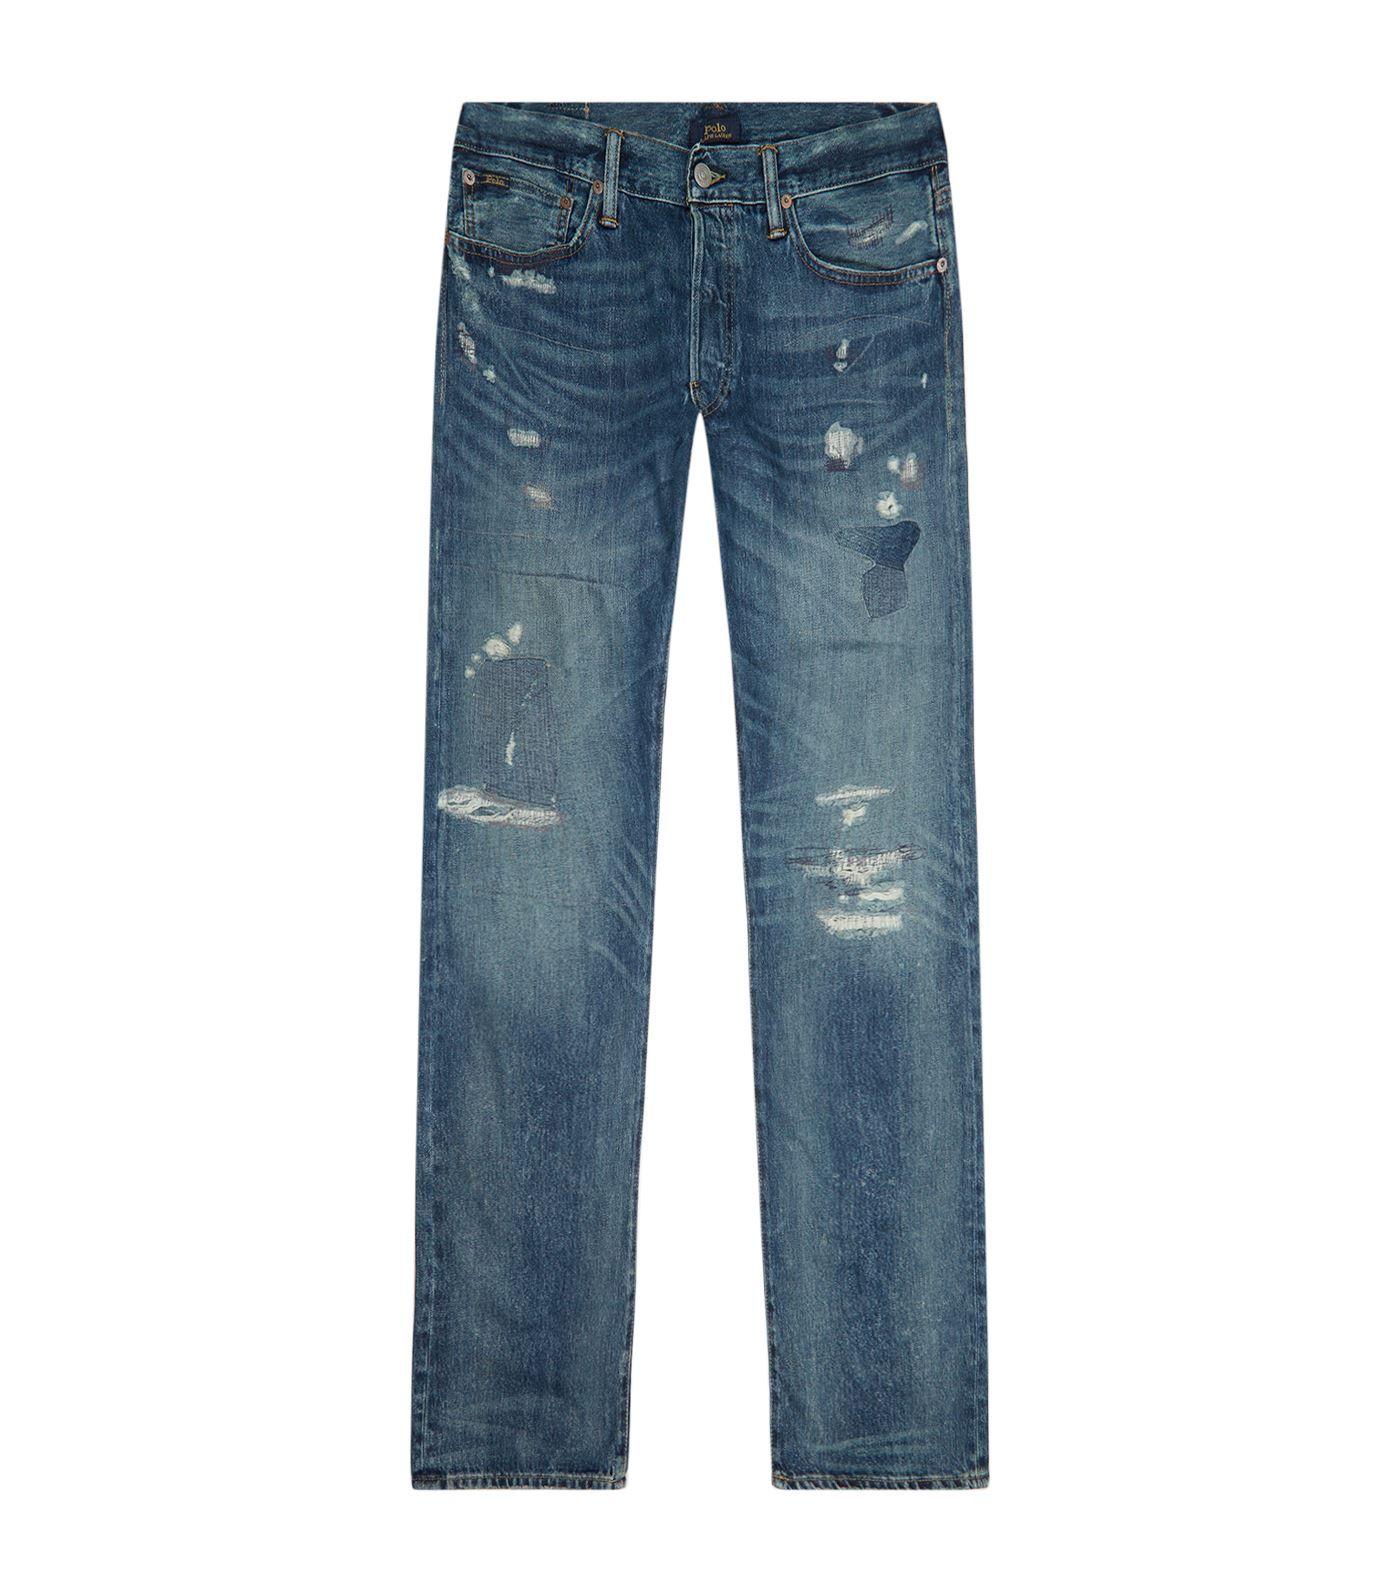 Polo ralph lauren varick slimfit distressed jeans